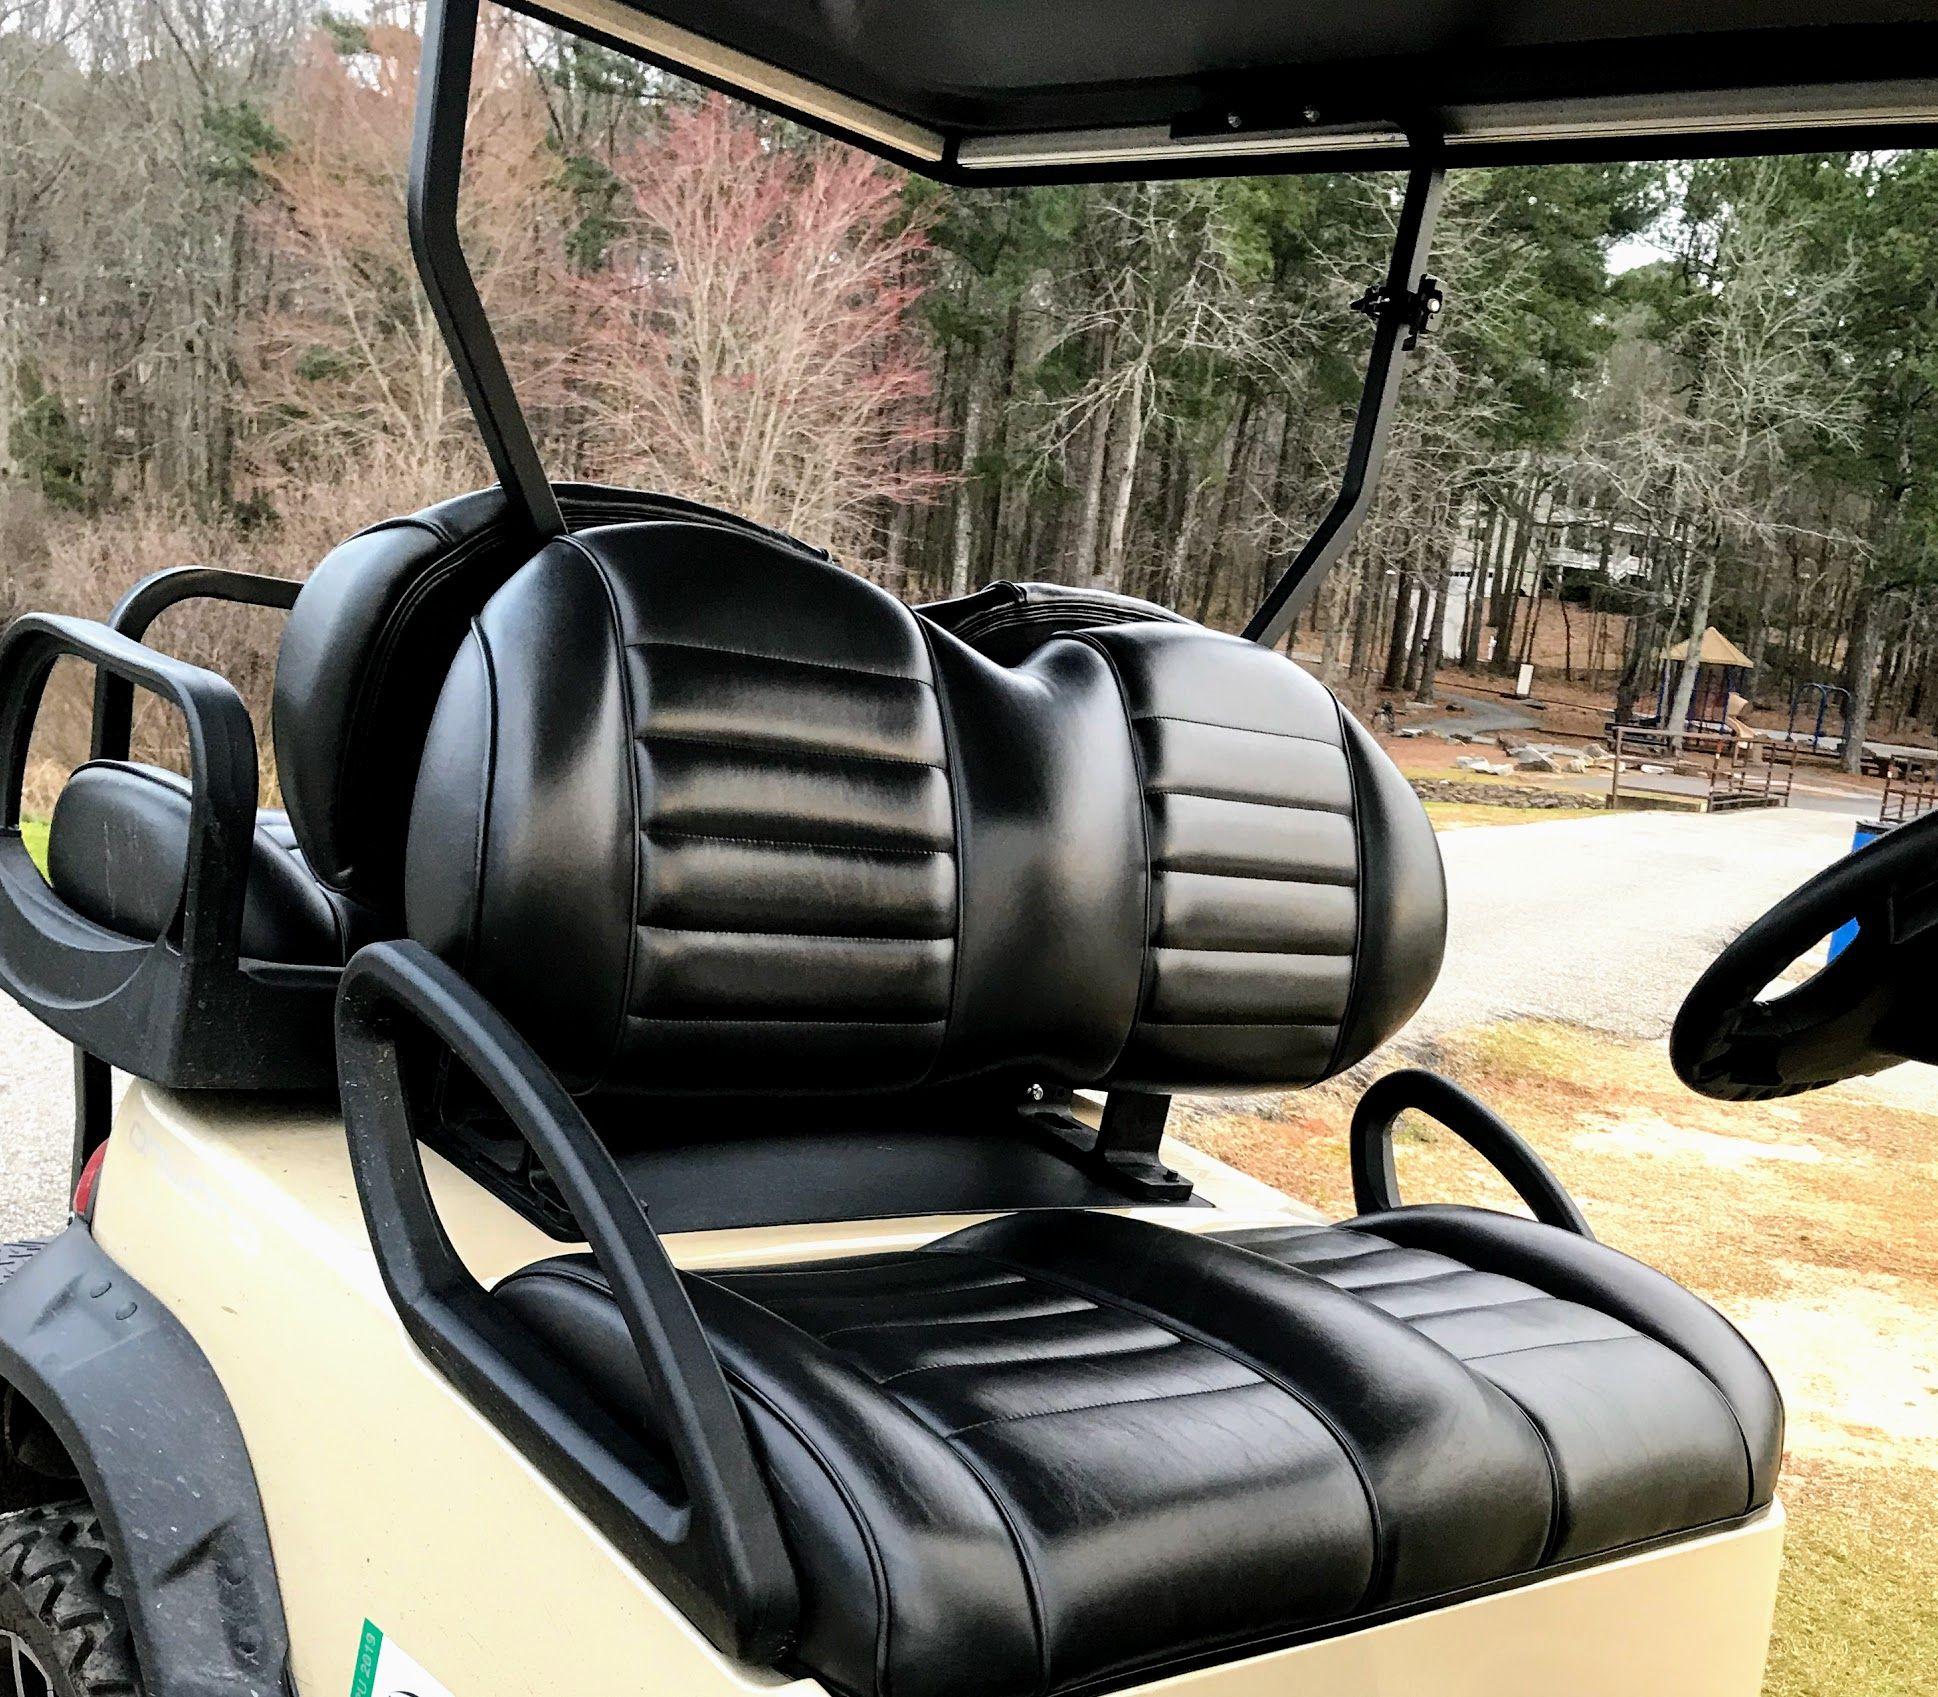 Golf Cart Seats Comfort Covers And Custom Designs Custom Car Seat Covers Custom Golf Carts Golf Cart Seats